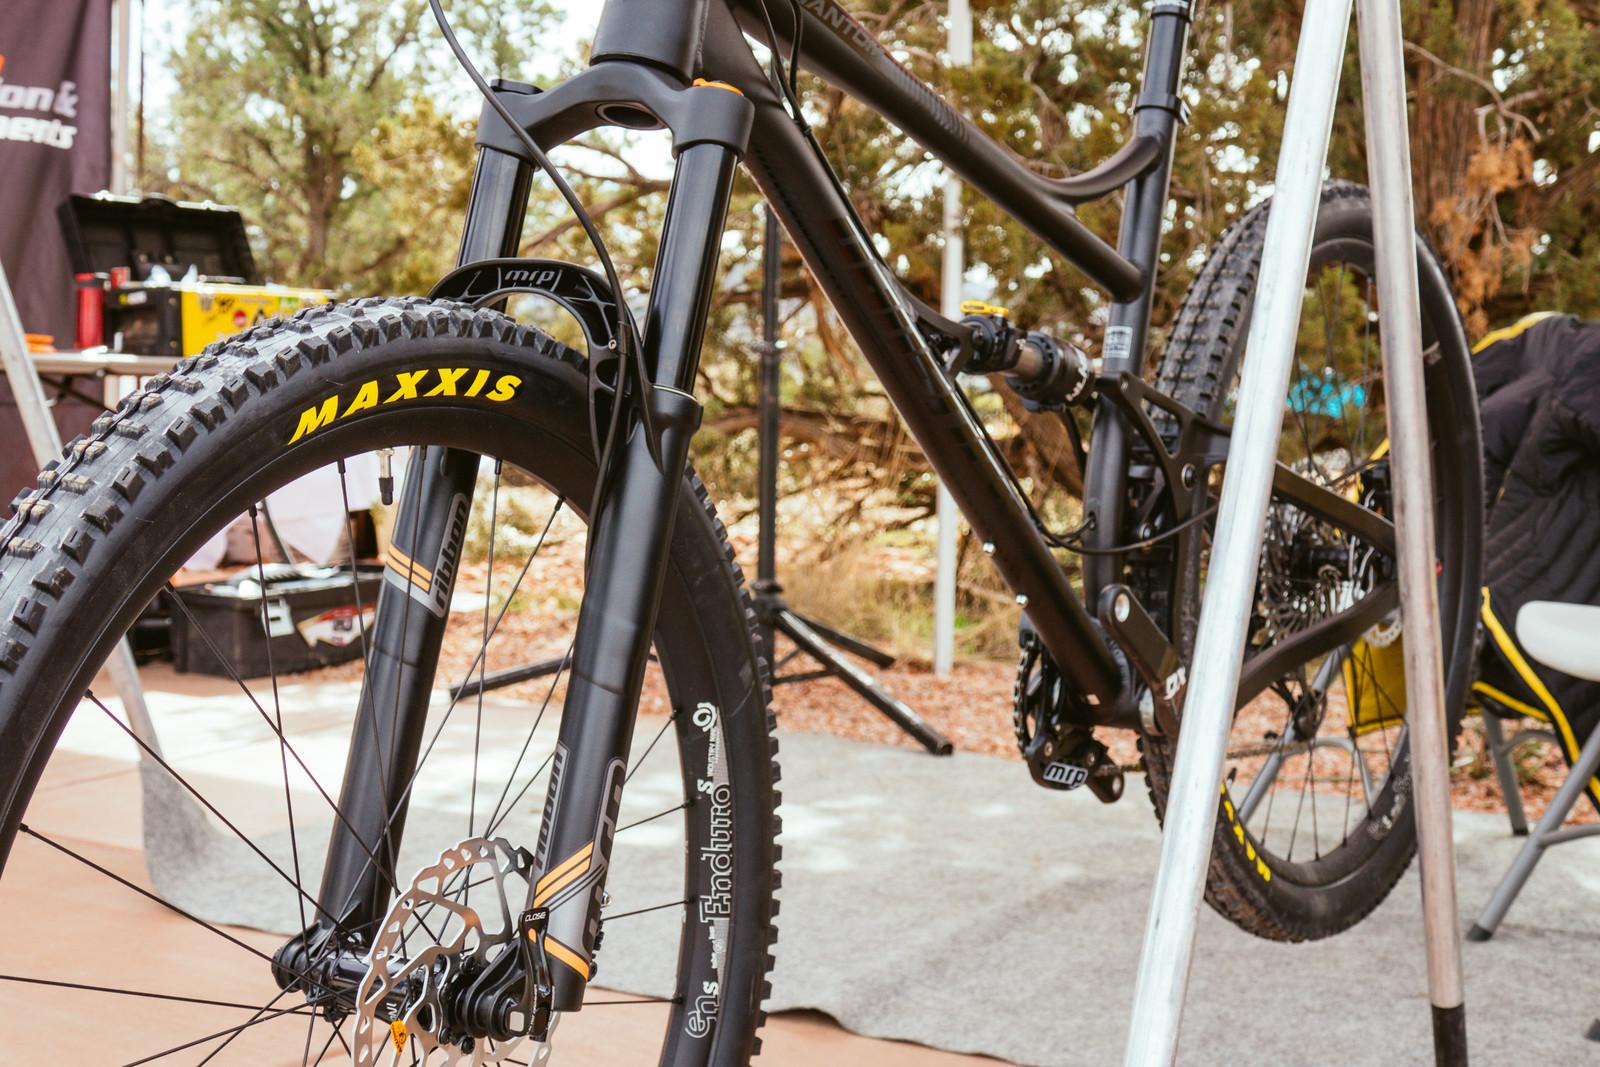 2017 MRP Ribbon Fork - PIT BITS - Fresh Products from the Sedona Mountain Bike Festival - Mountain Biking Pictures - Vital MTB